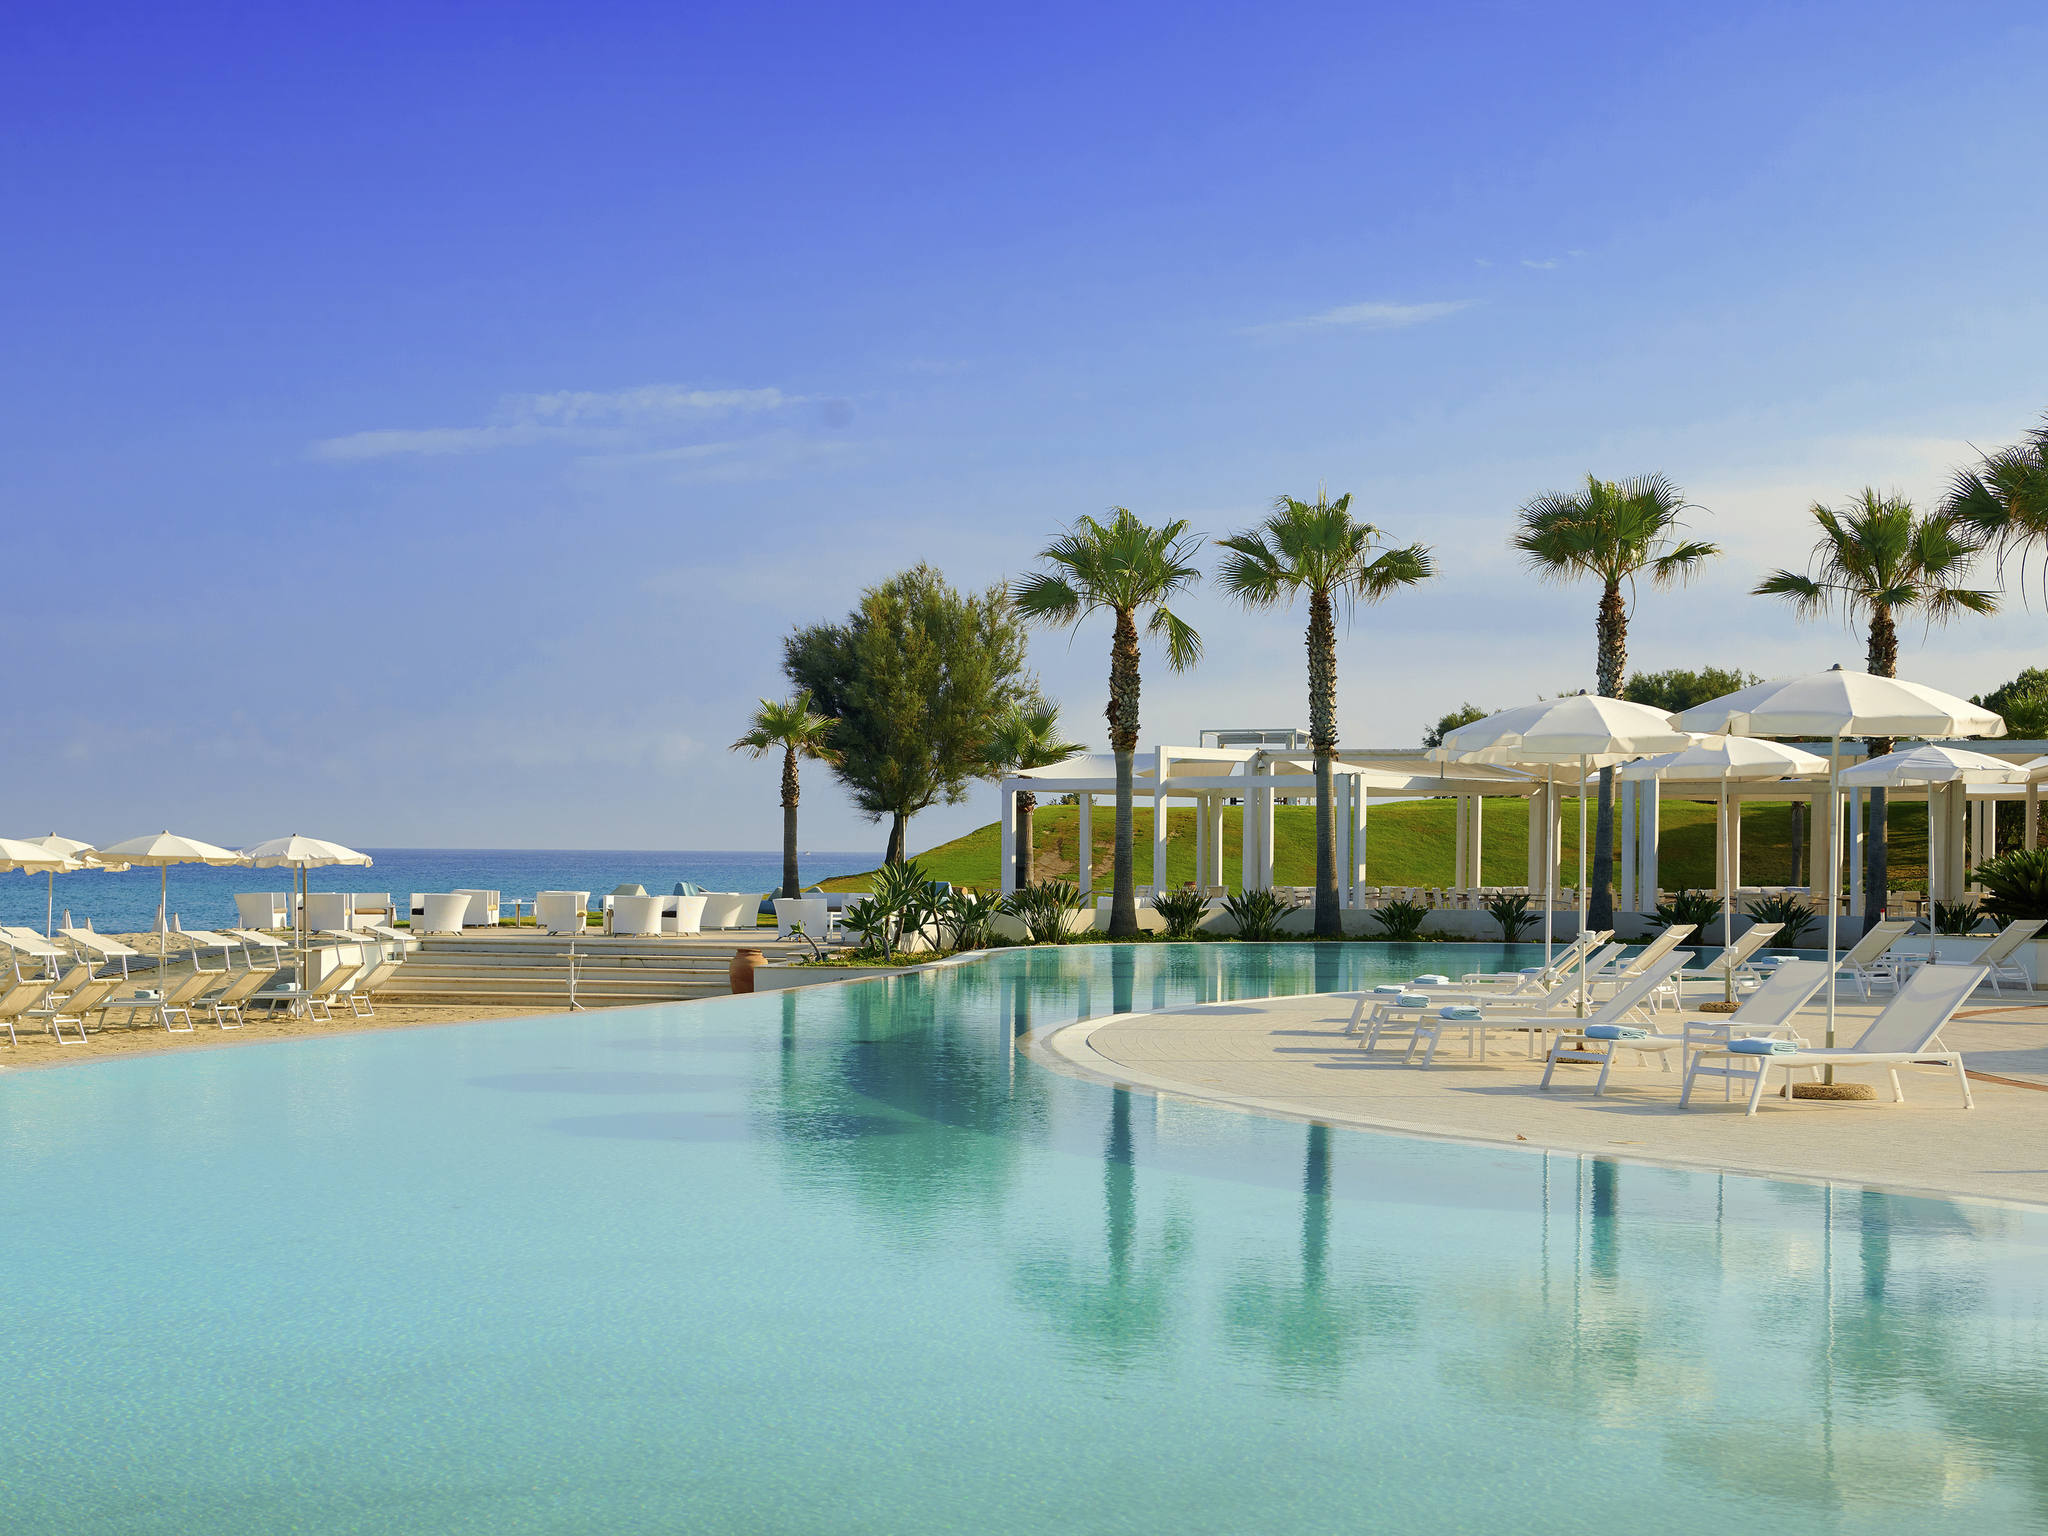 Hotel - Capovaticano Resort Thalasso & Spa - MGallery by Sofitel